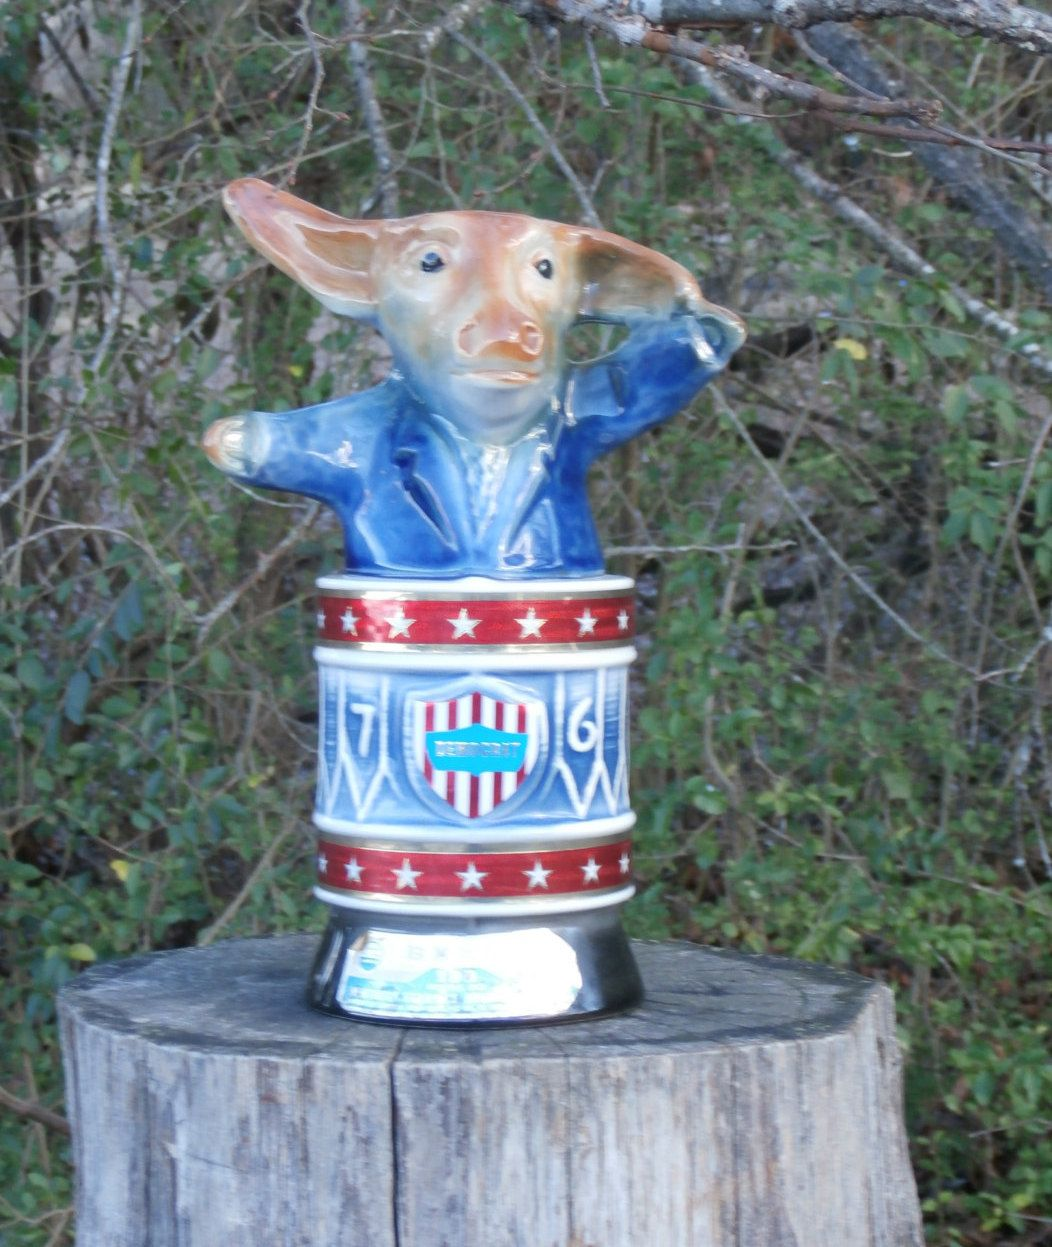 1976 Bicentennial Decanter Bottle, Democrat Donkey, Vintage Jim Beam Ceramic Figural